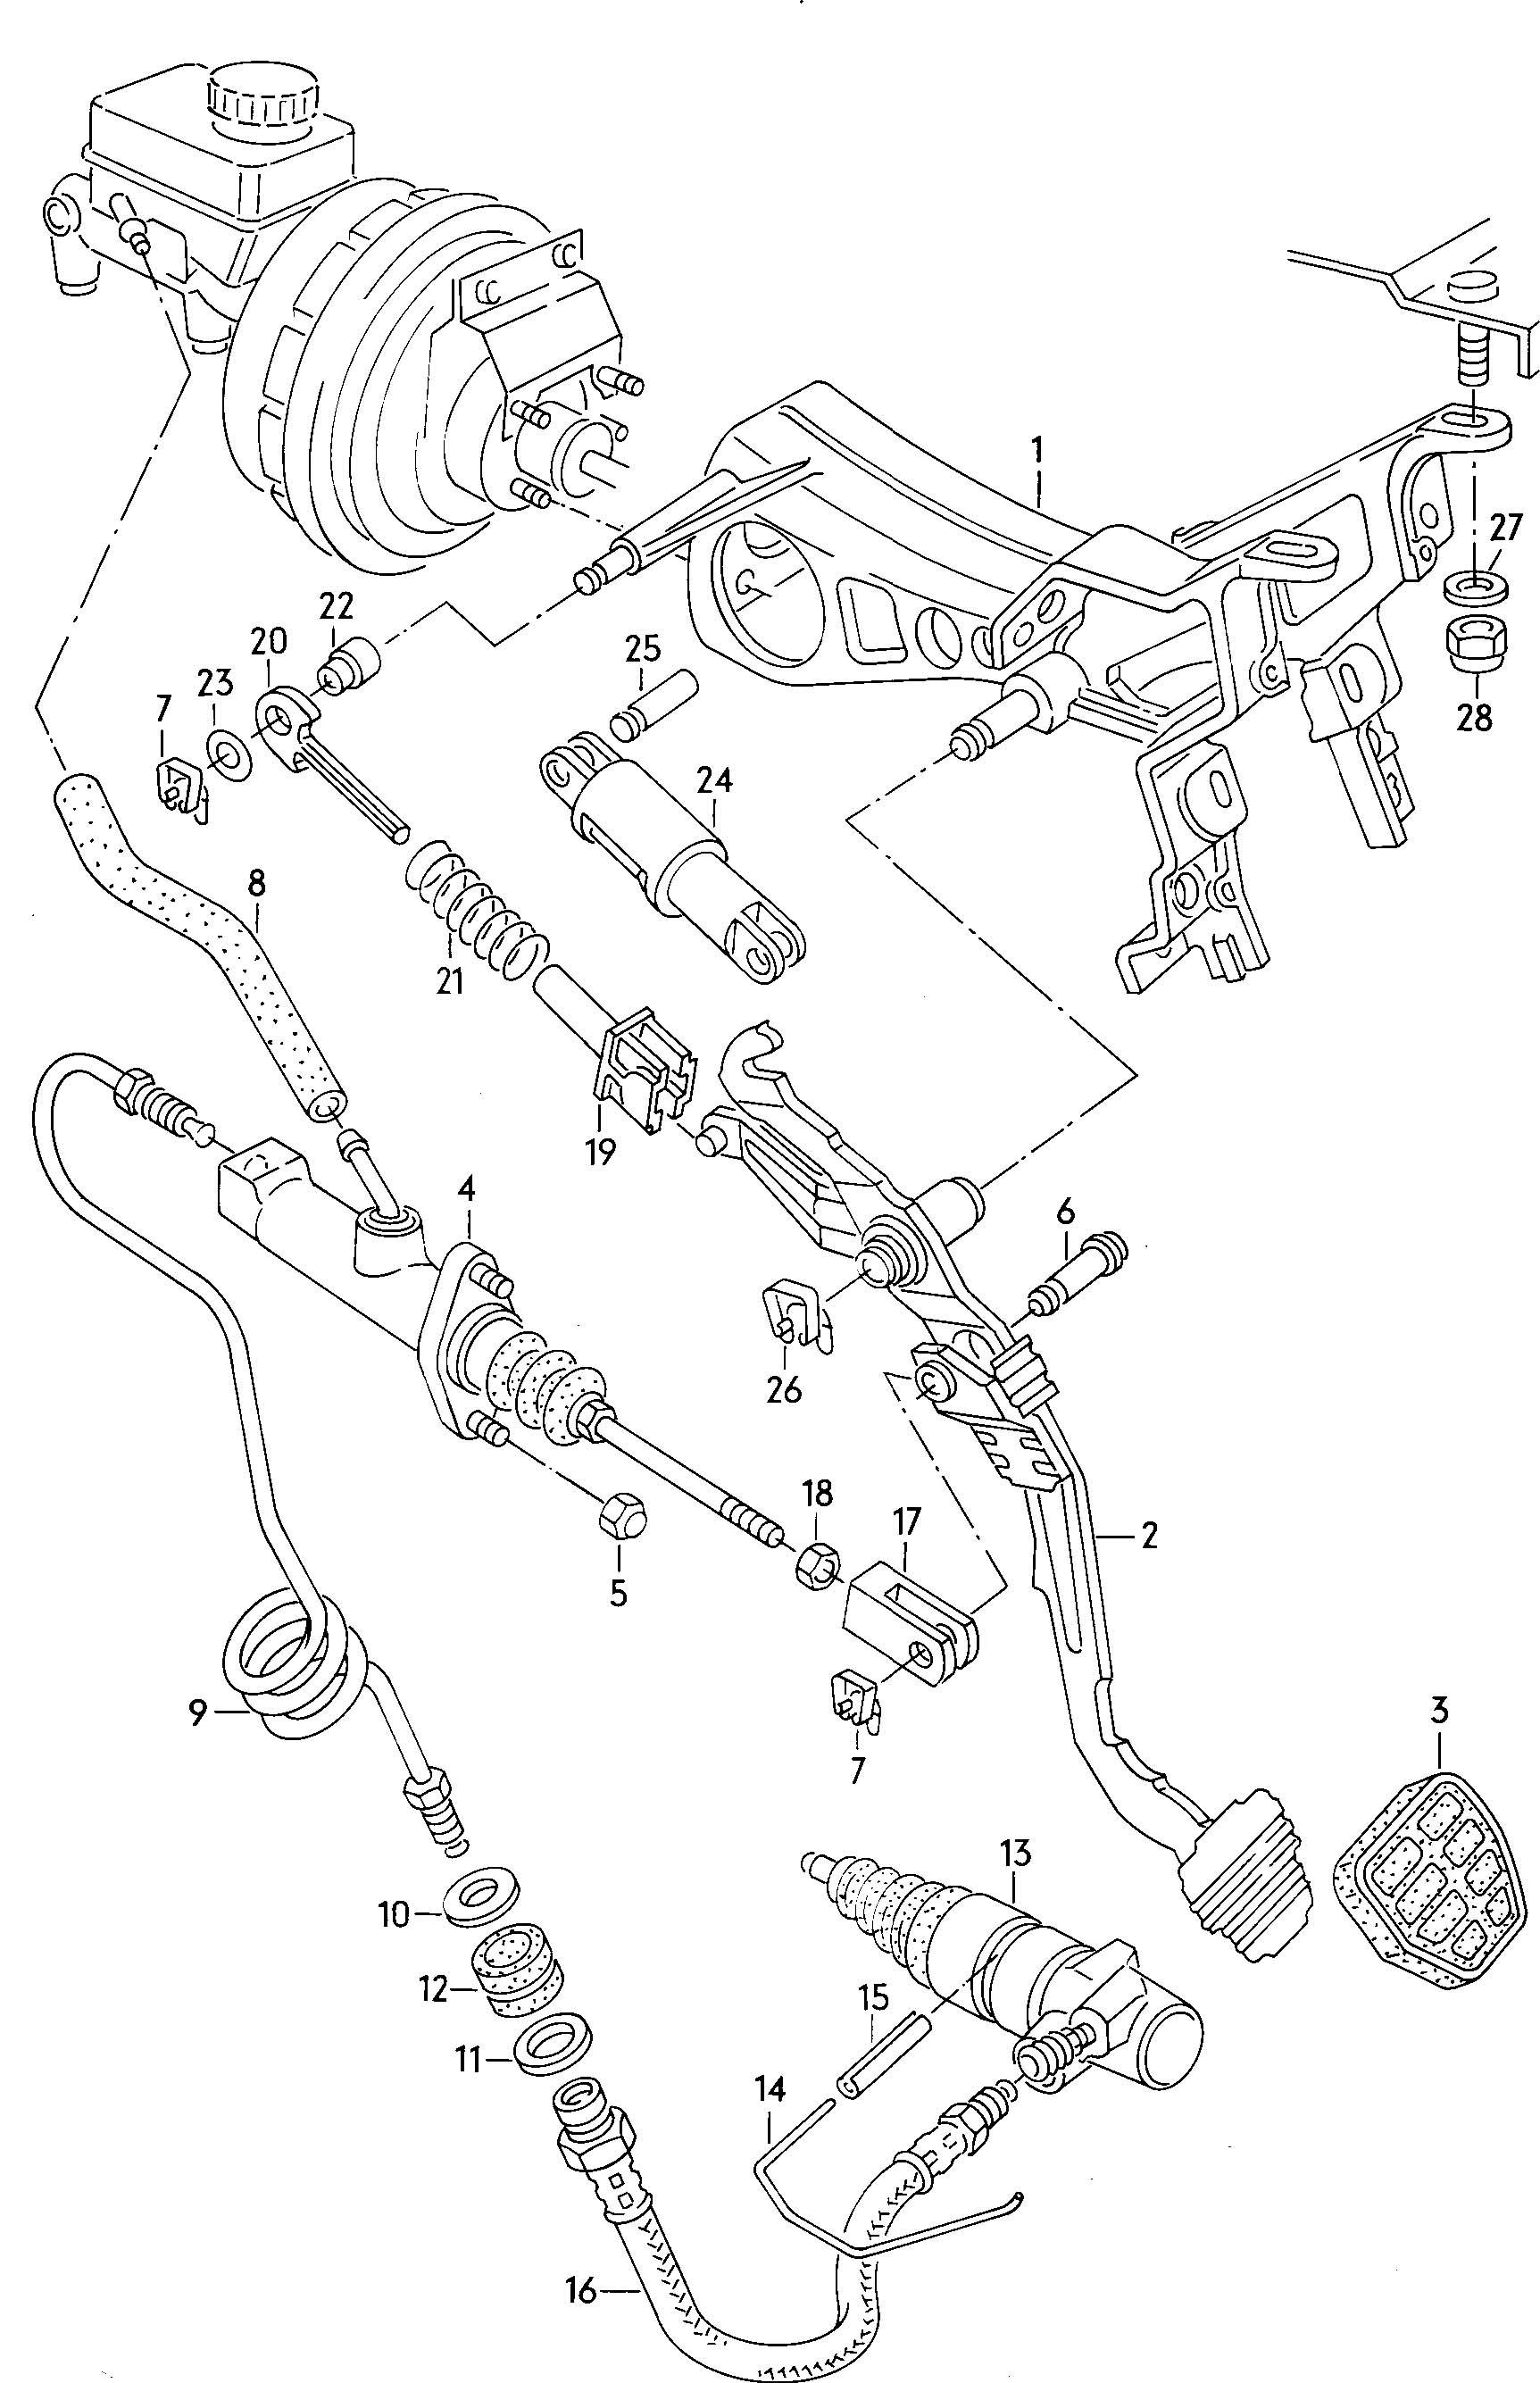 Volkswagen Quantum Bracket For Pedal Cluster Brake And Clutch Pedals Cluster Clutch Pedal For